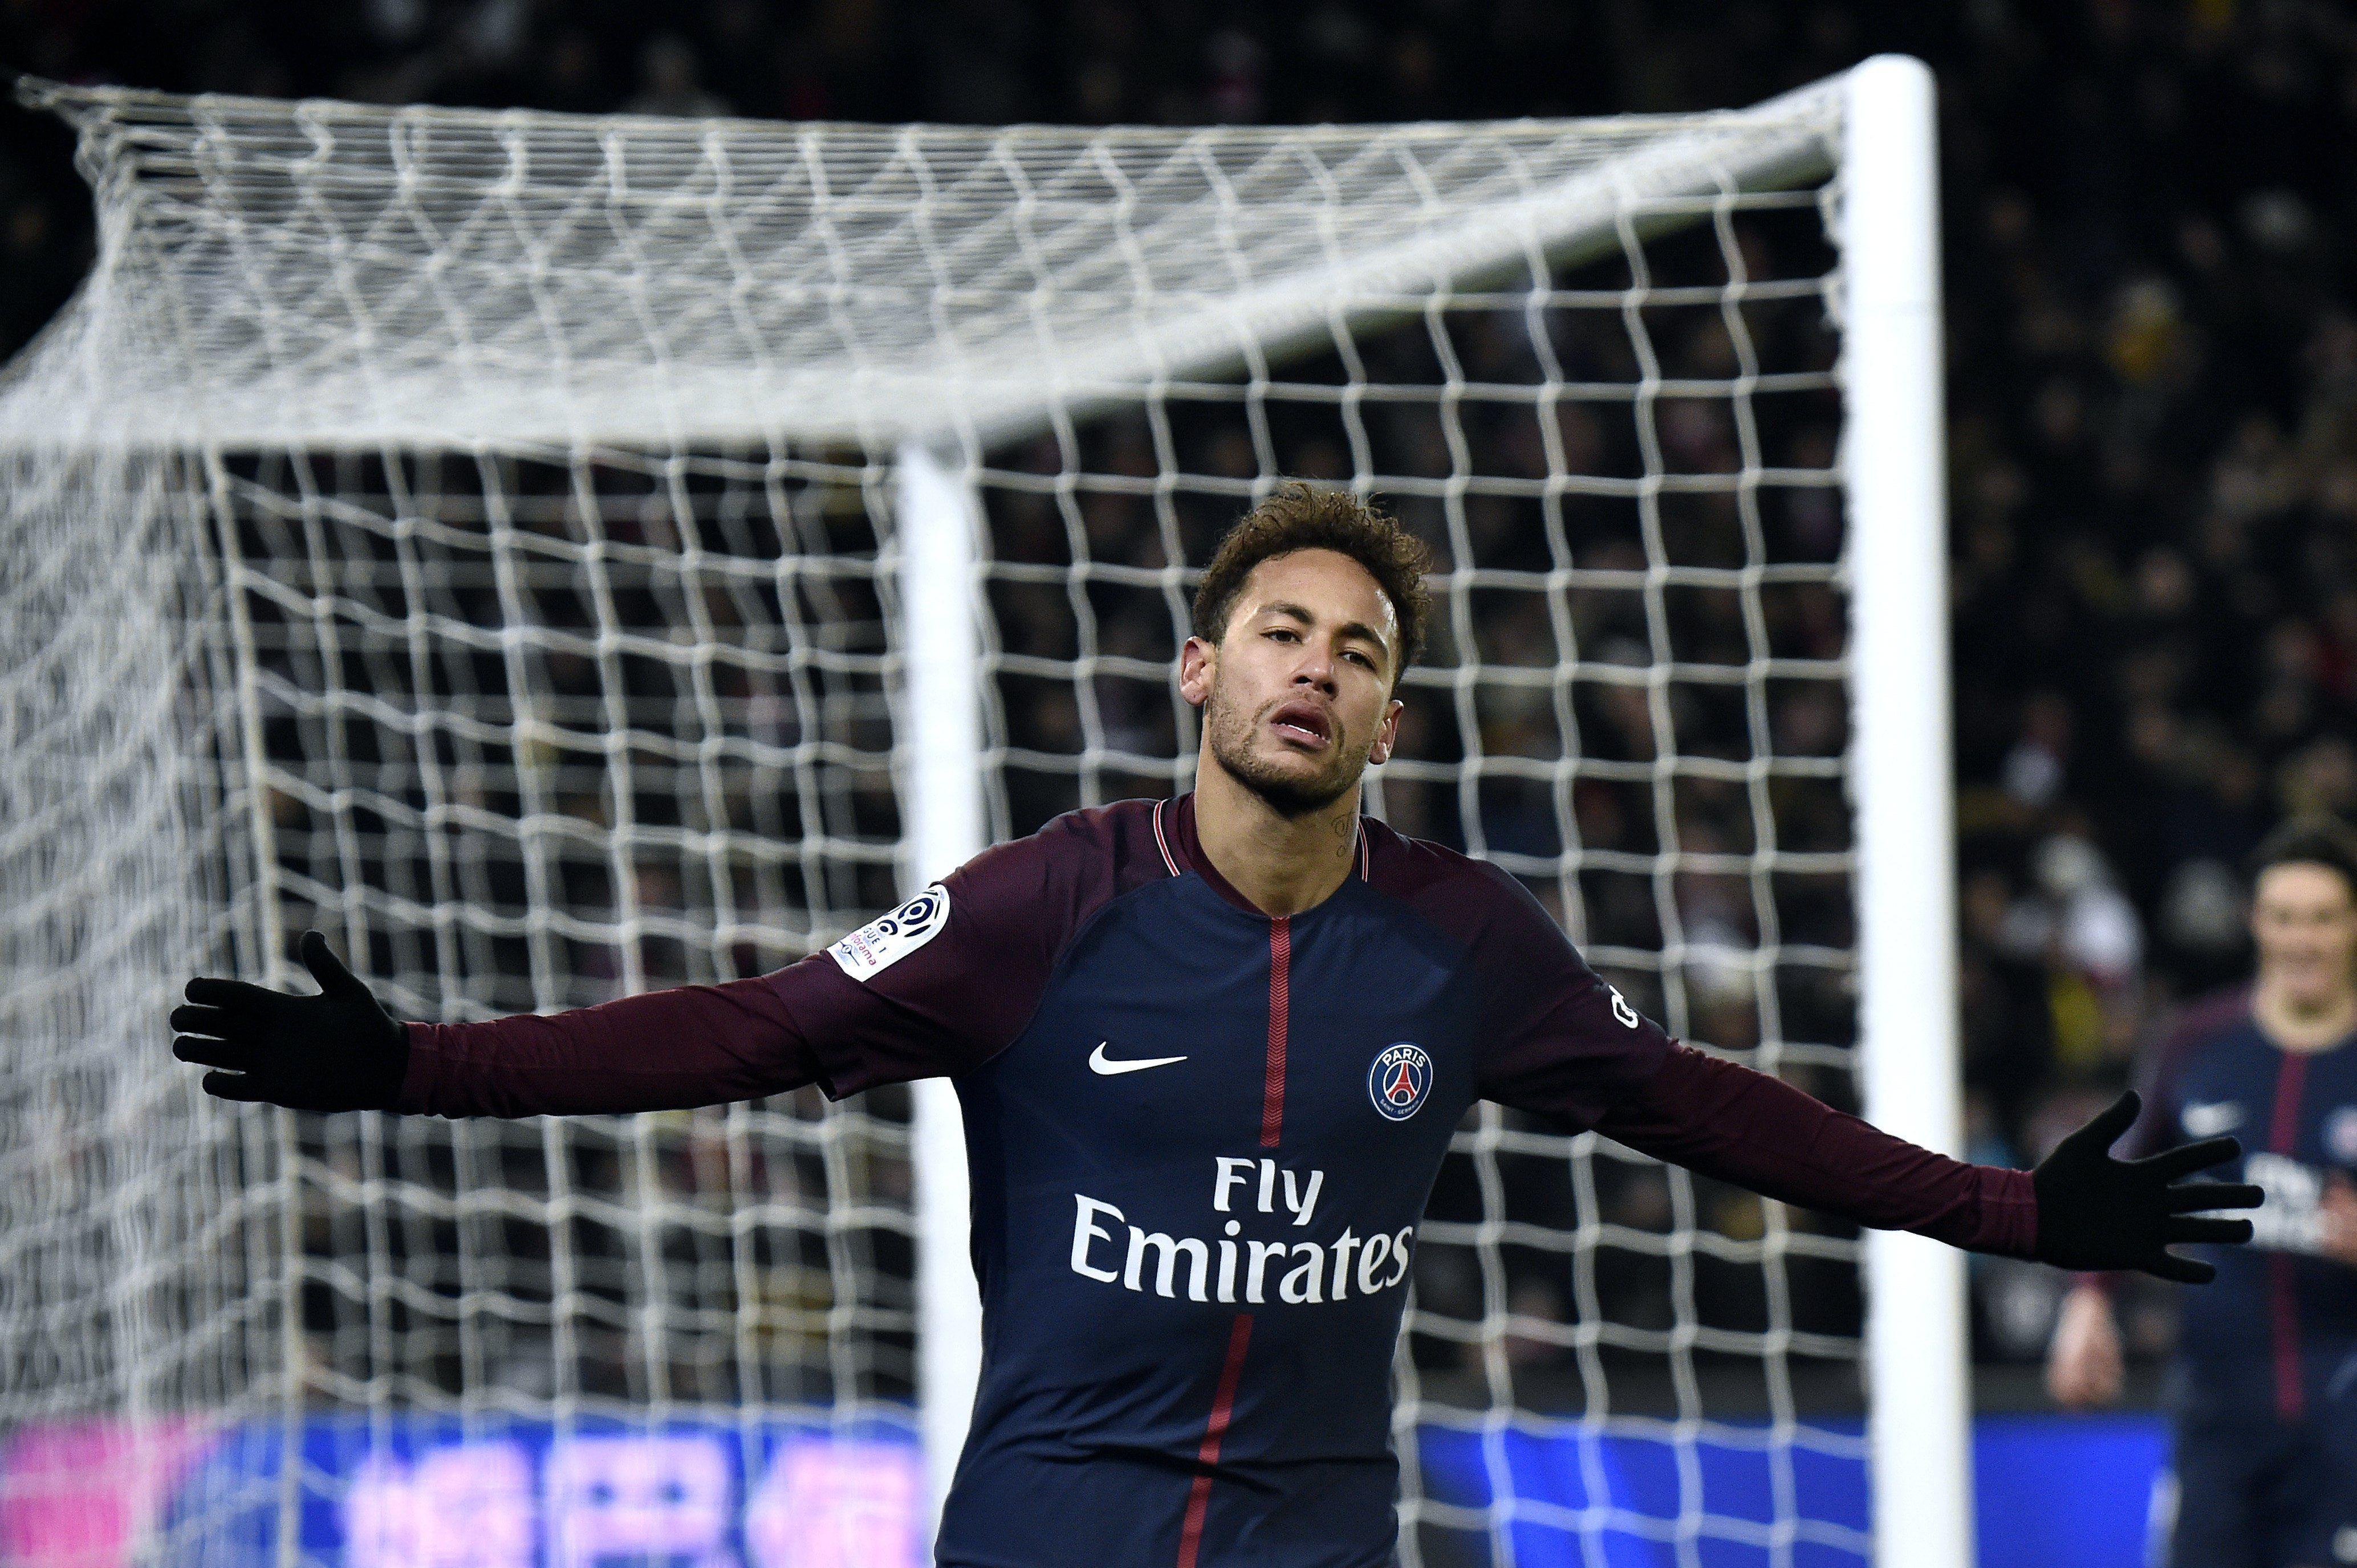 Fin del misterio: Neymar llegó a Brasil para operarse y estará dos meses sin jugar